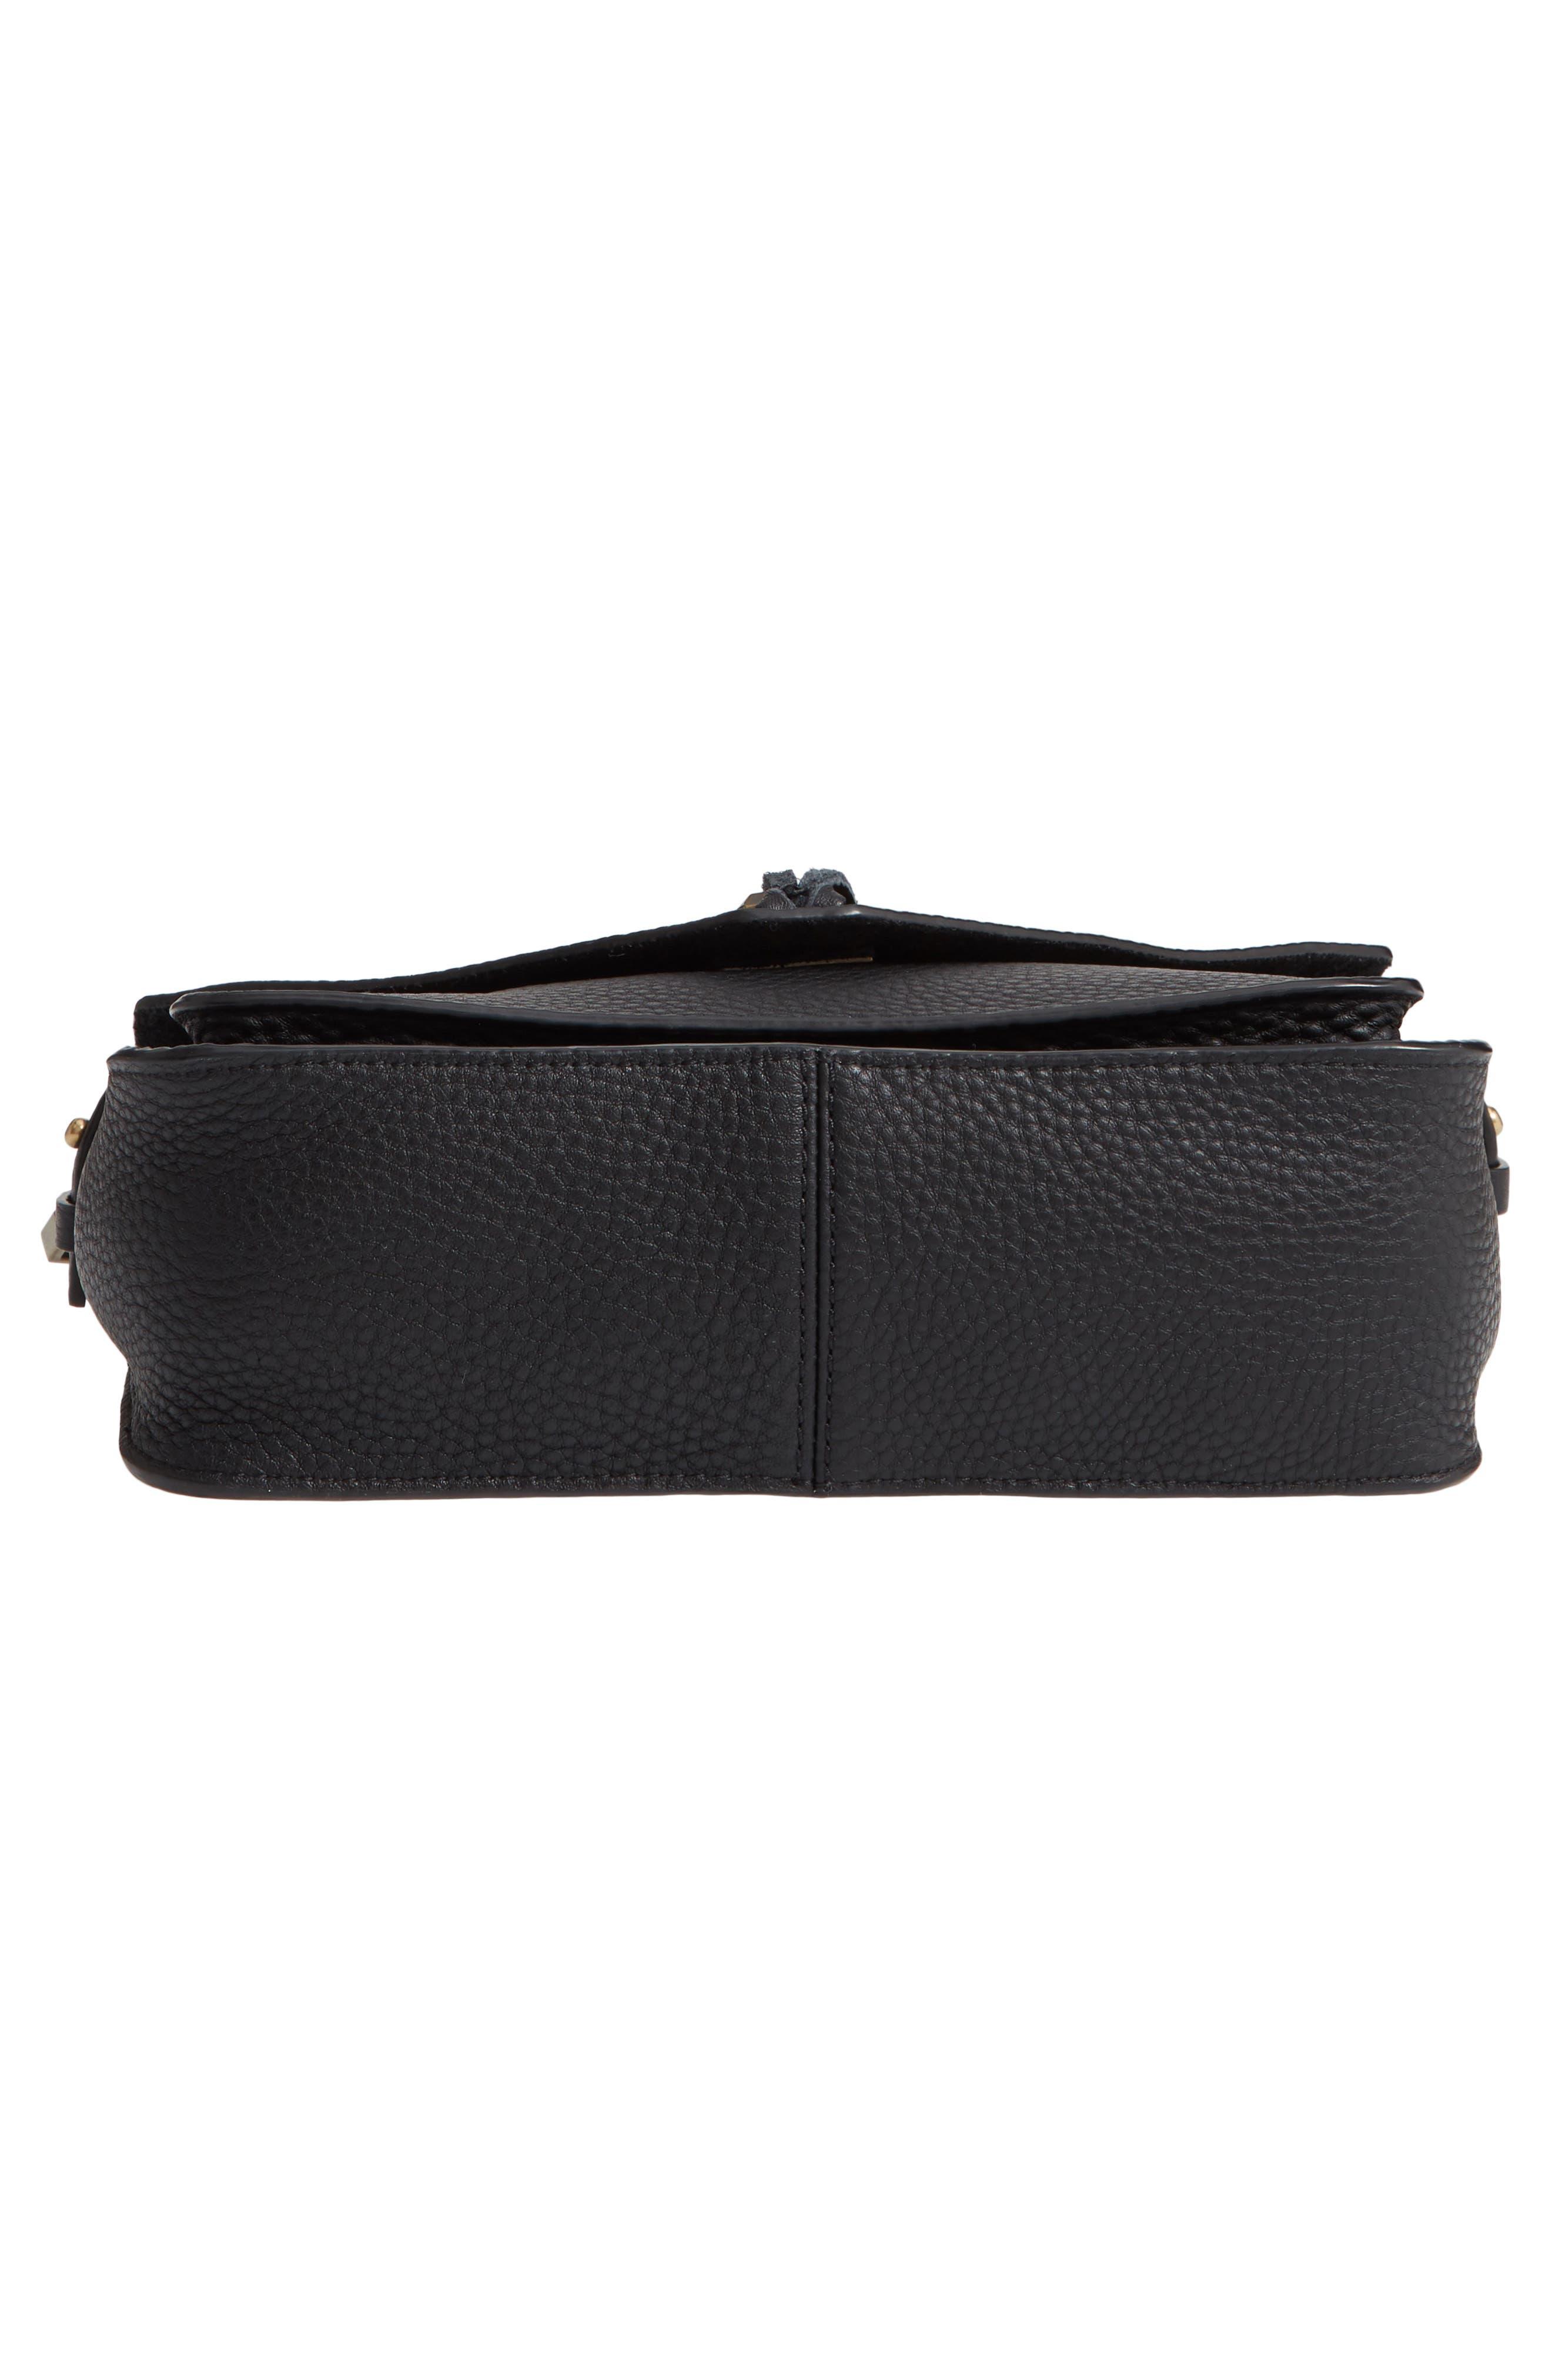 REBECCA MINKOFF, 'Small Darren' Leather Messenger Bag, Alternate thumbnail 6, color, BLACK